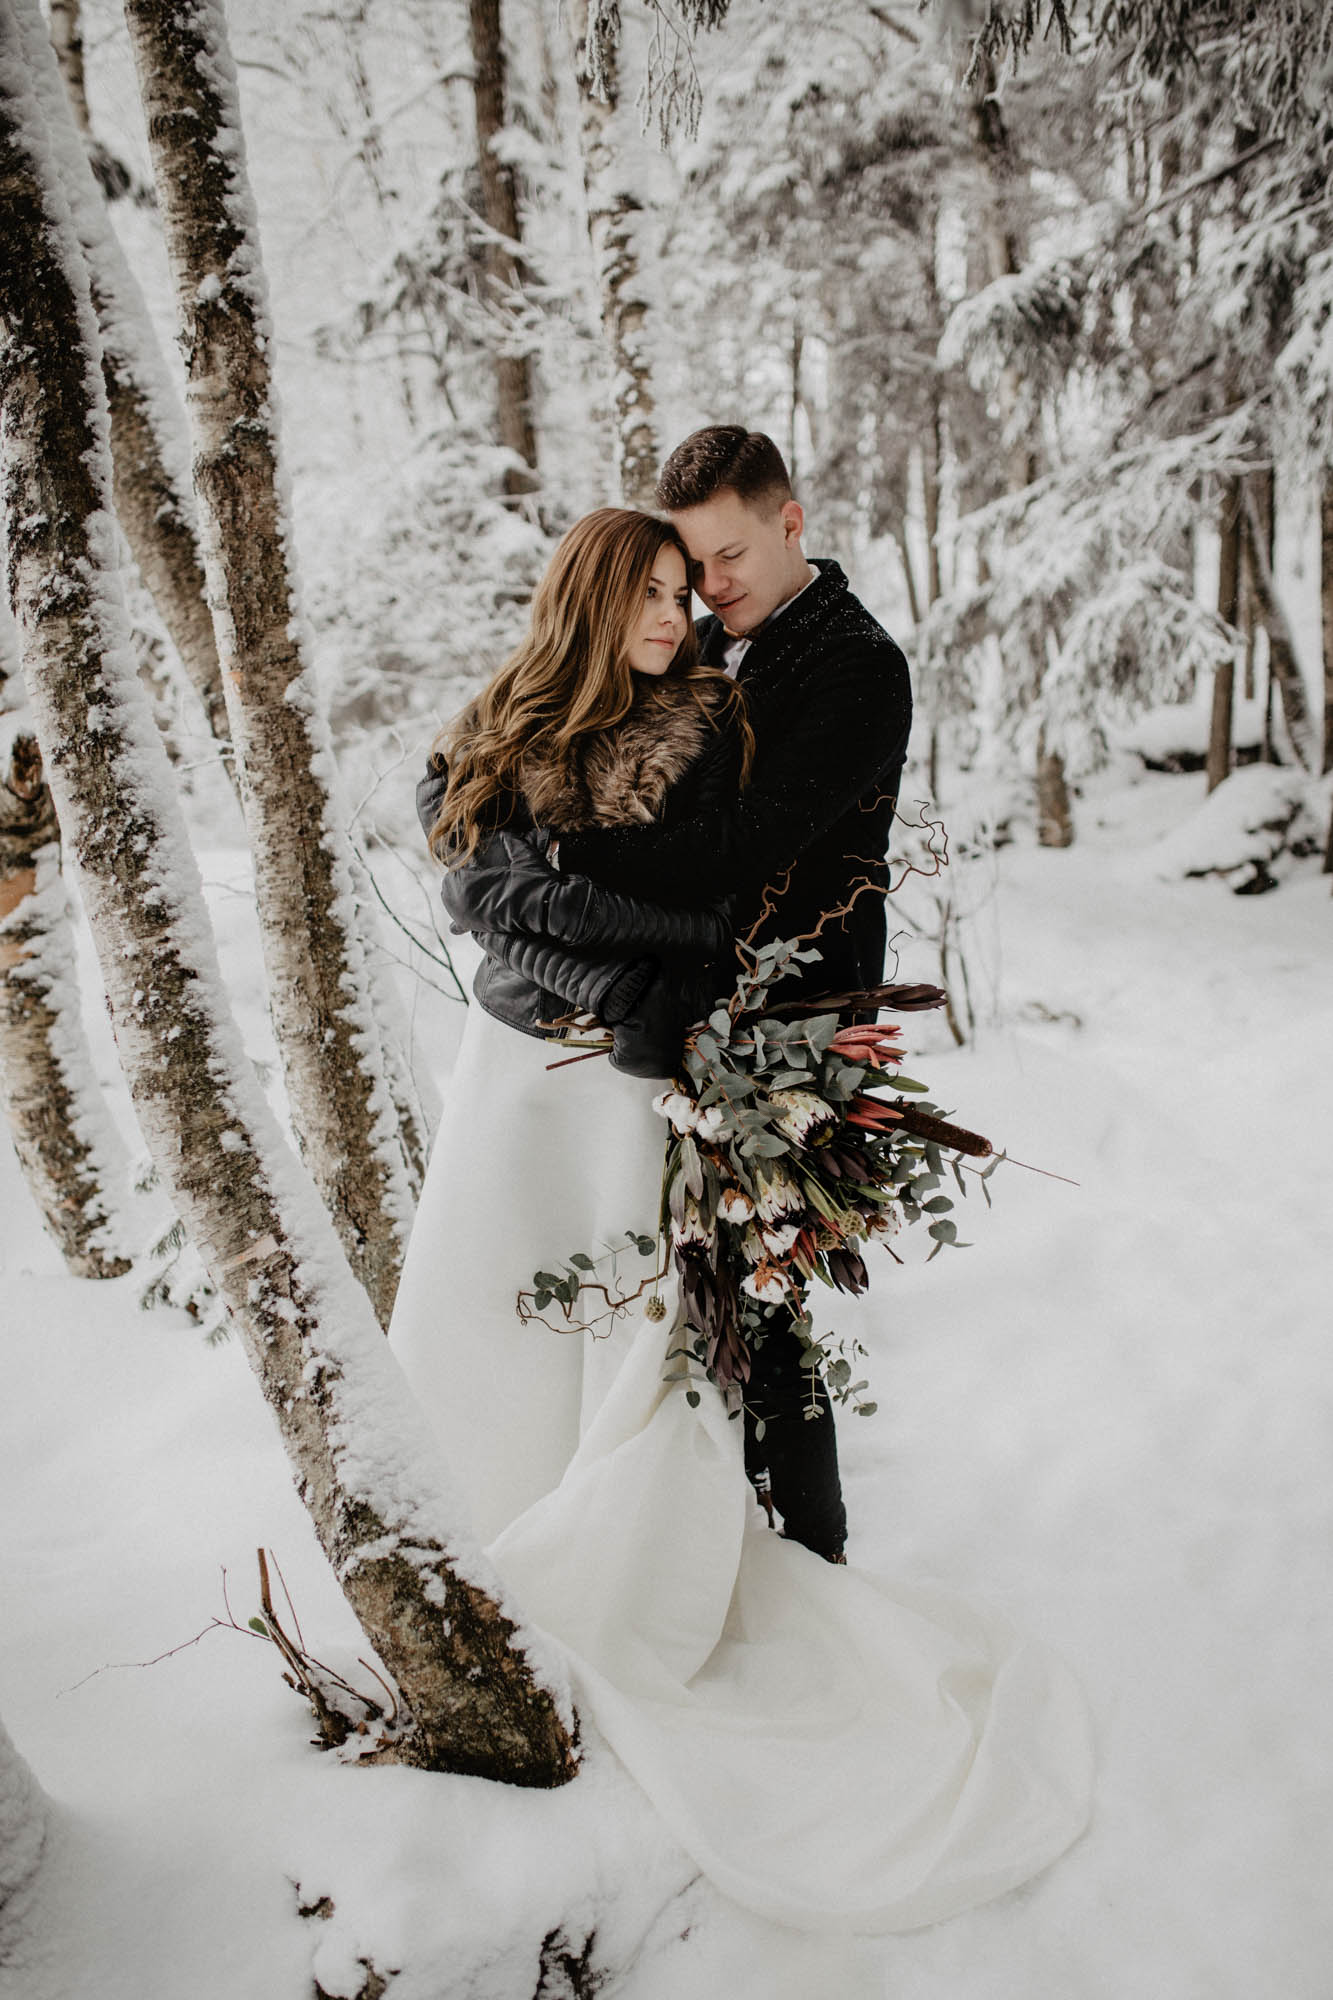 ashley_schulman_photography-winter_wedding_tampere-20.jpg